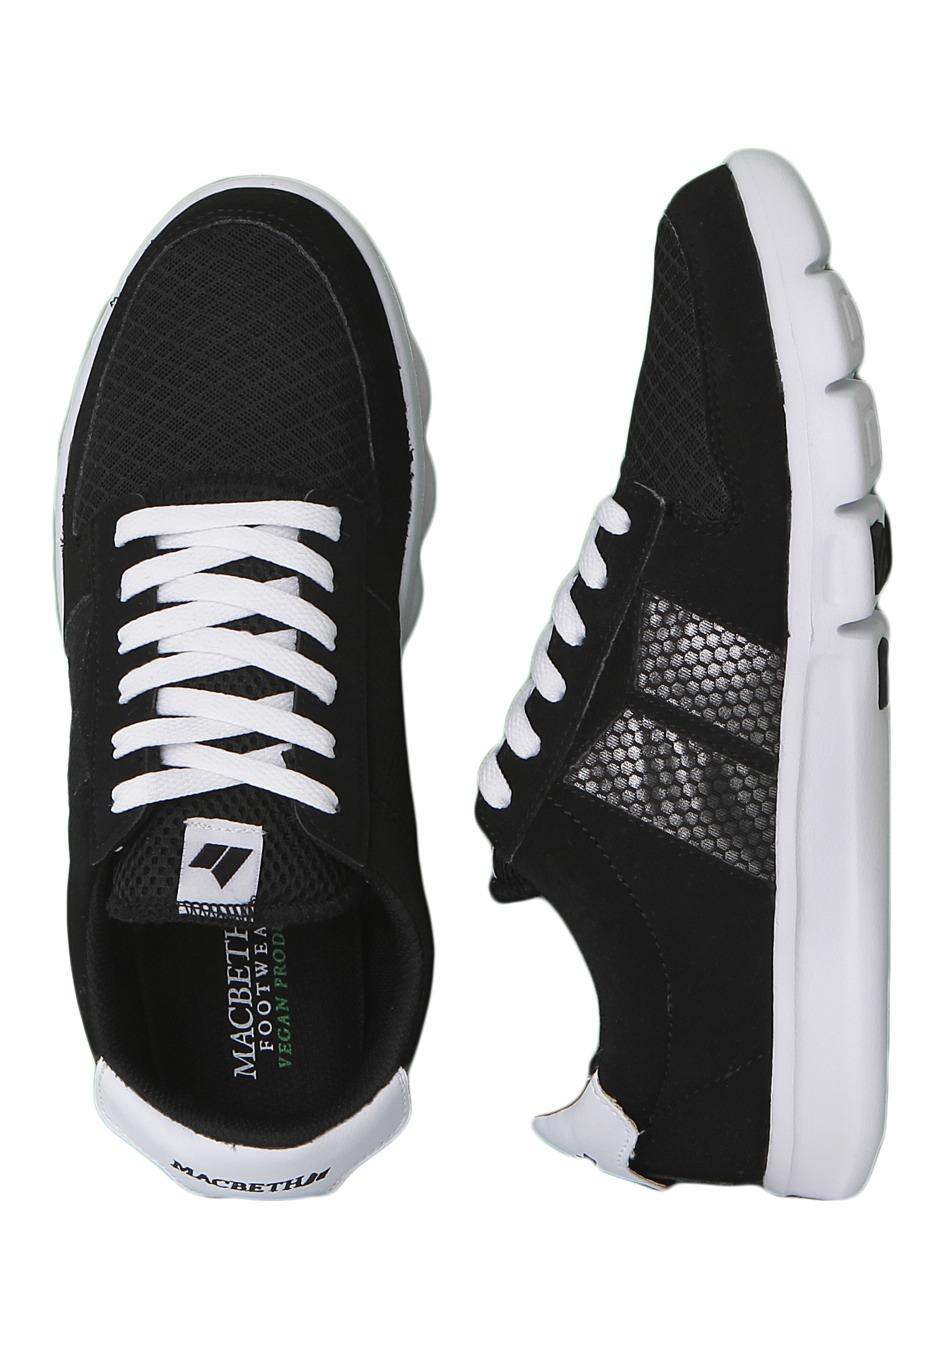 . Macbeth   Bradley Black White   Shoes   Impericon com Worldwide